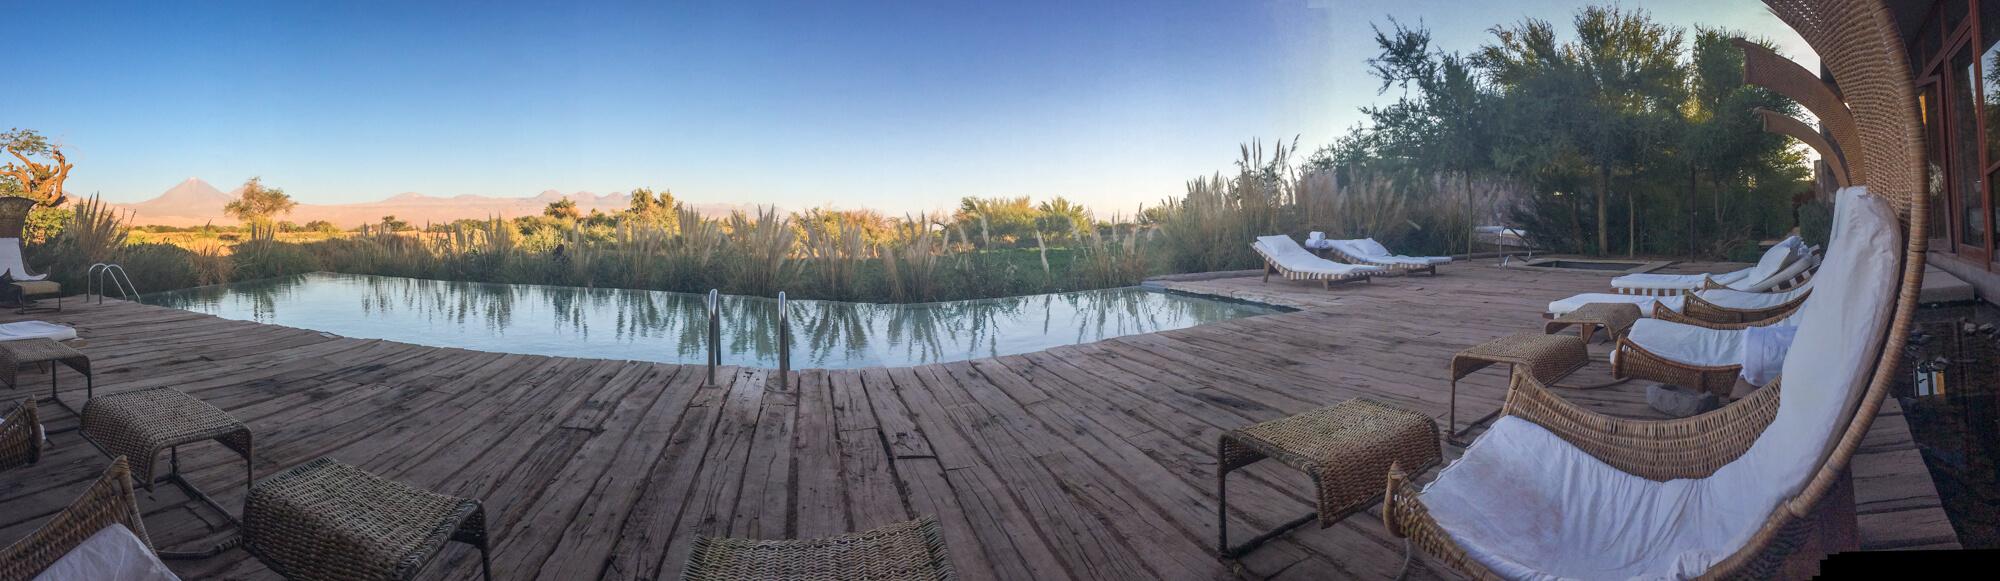 Pool view Tierra Atacama